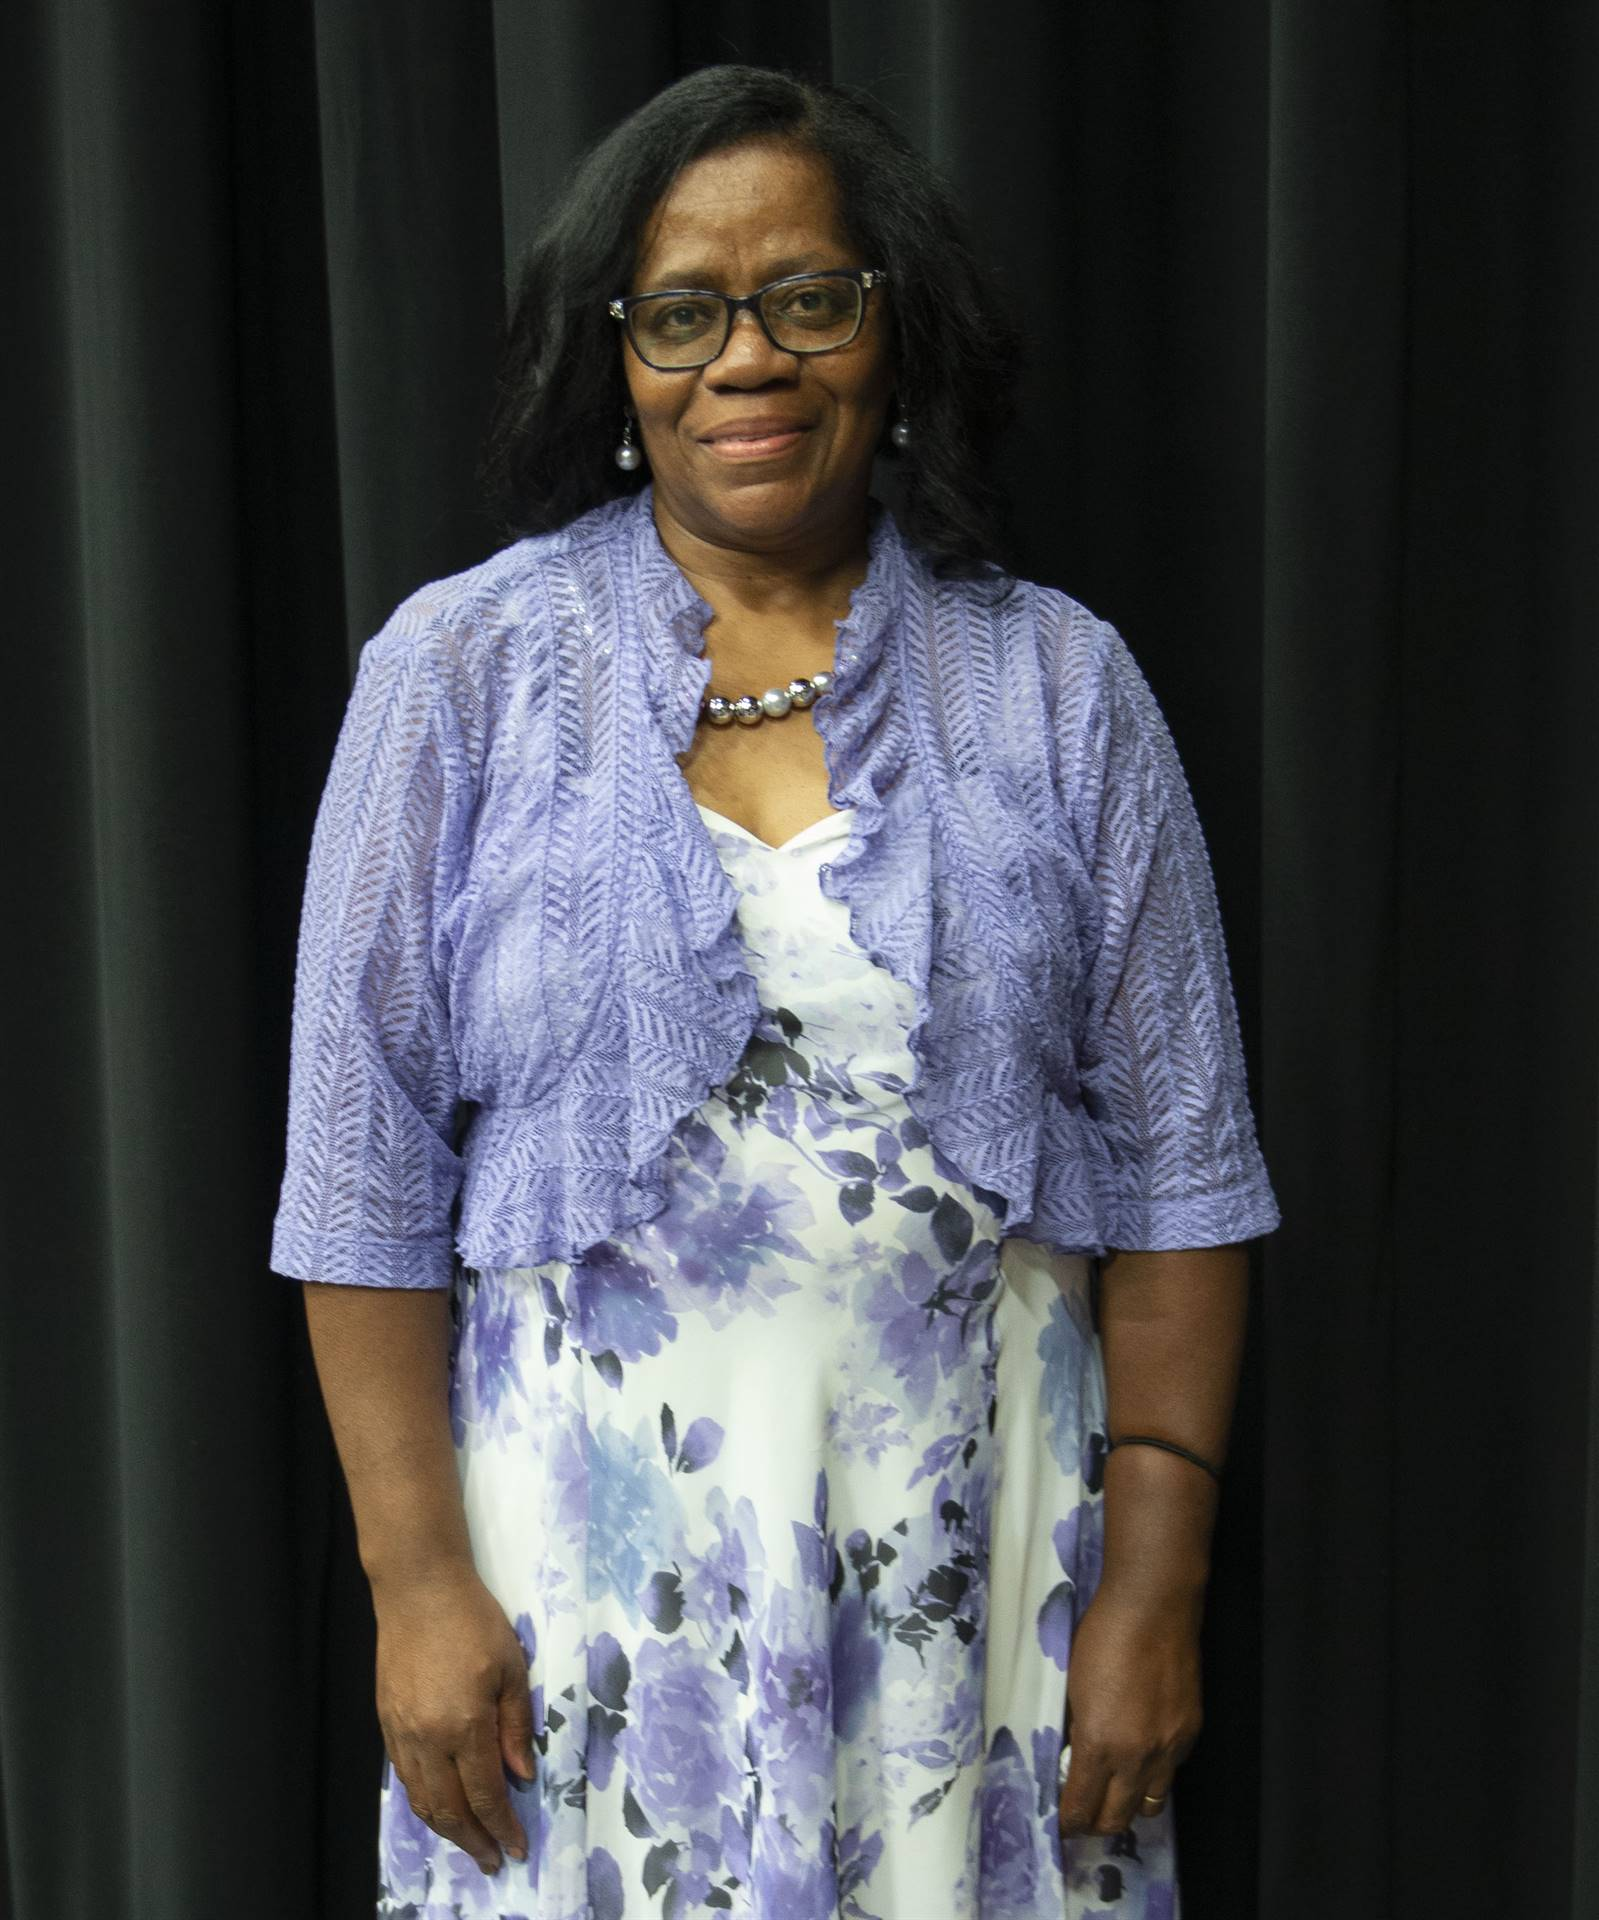 Mrs. Janice Cain - jcain@goquips.org